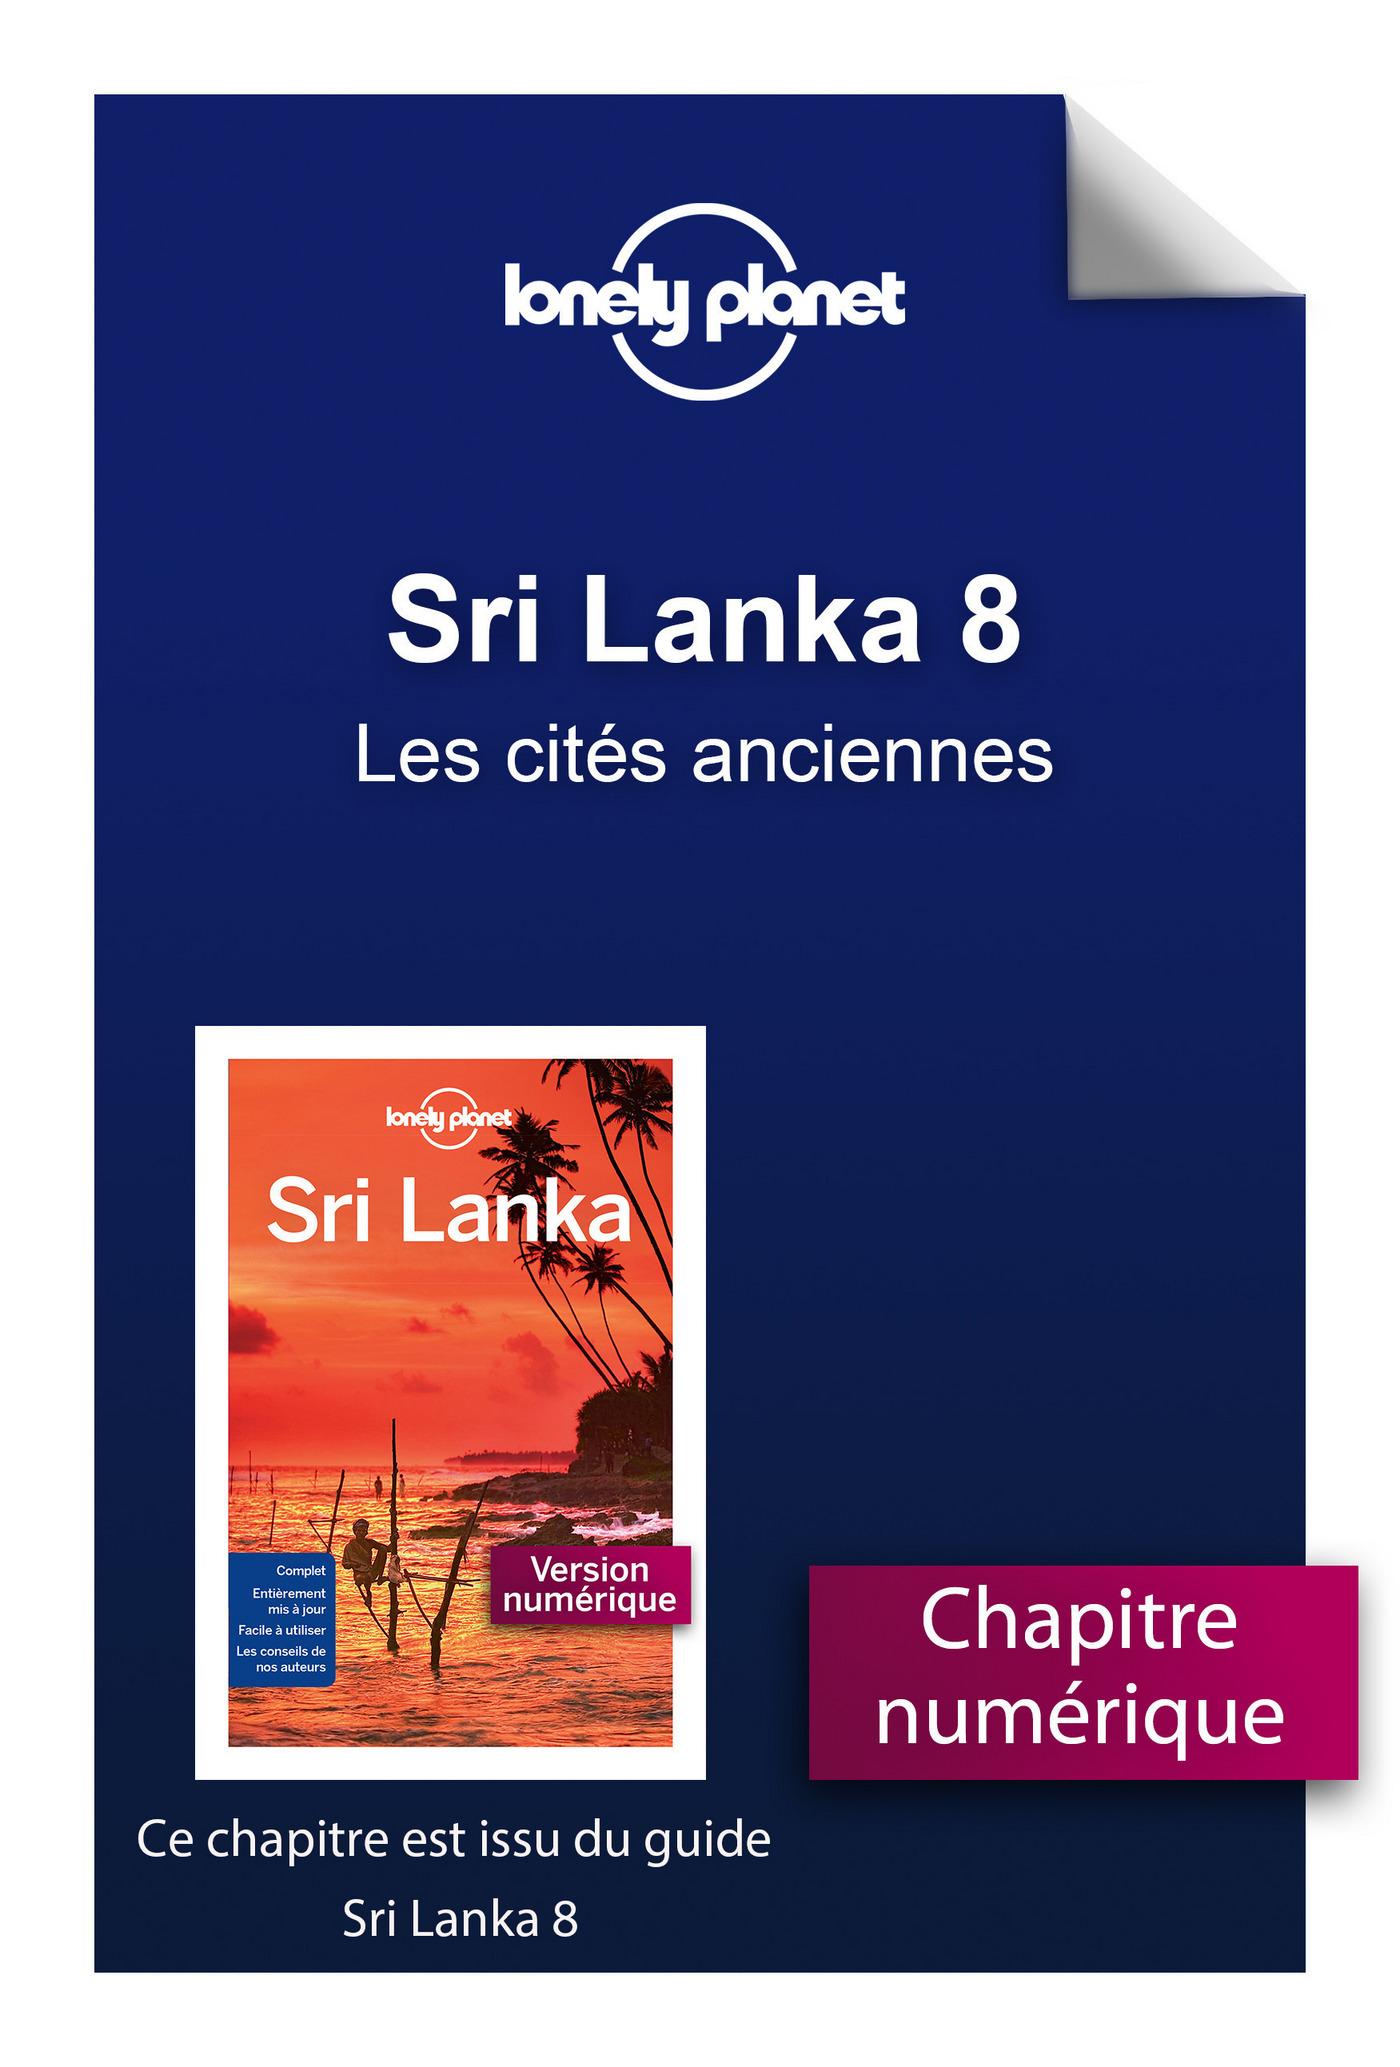 Sri Lanka 8 - Les cités anciennes